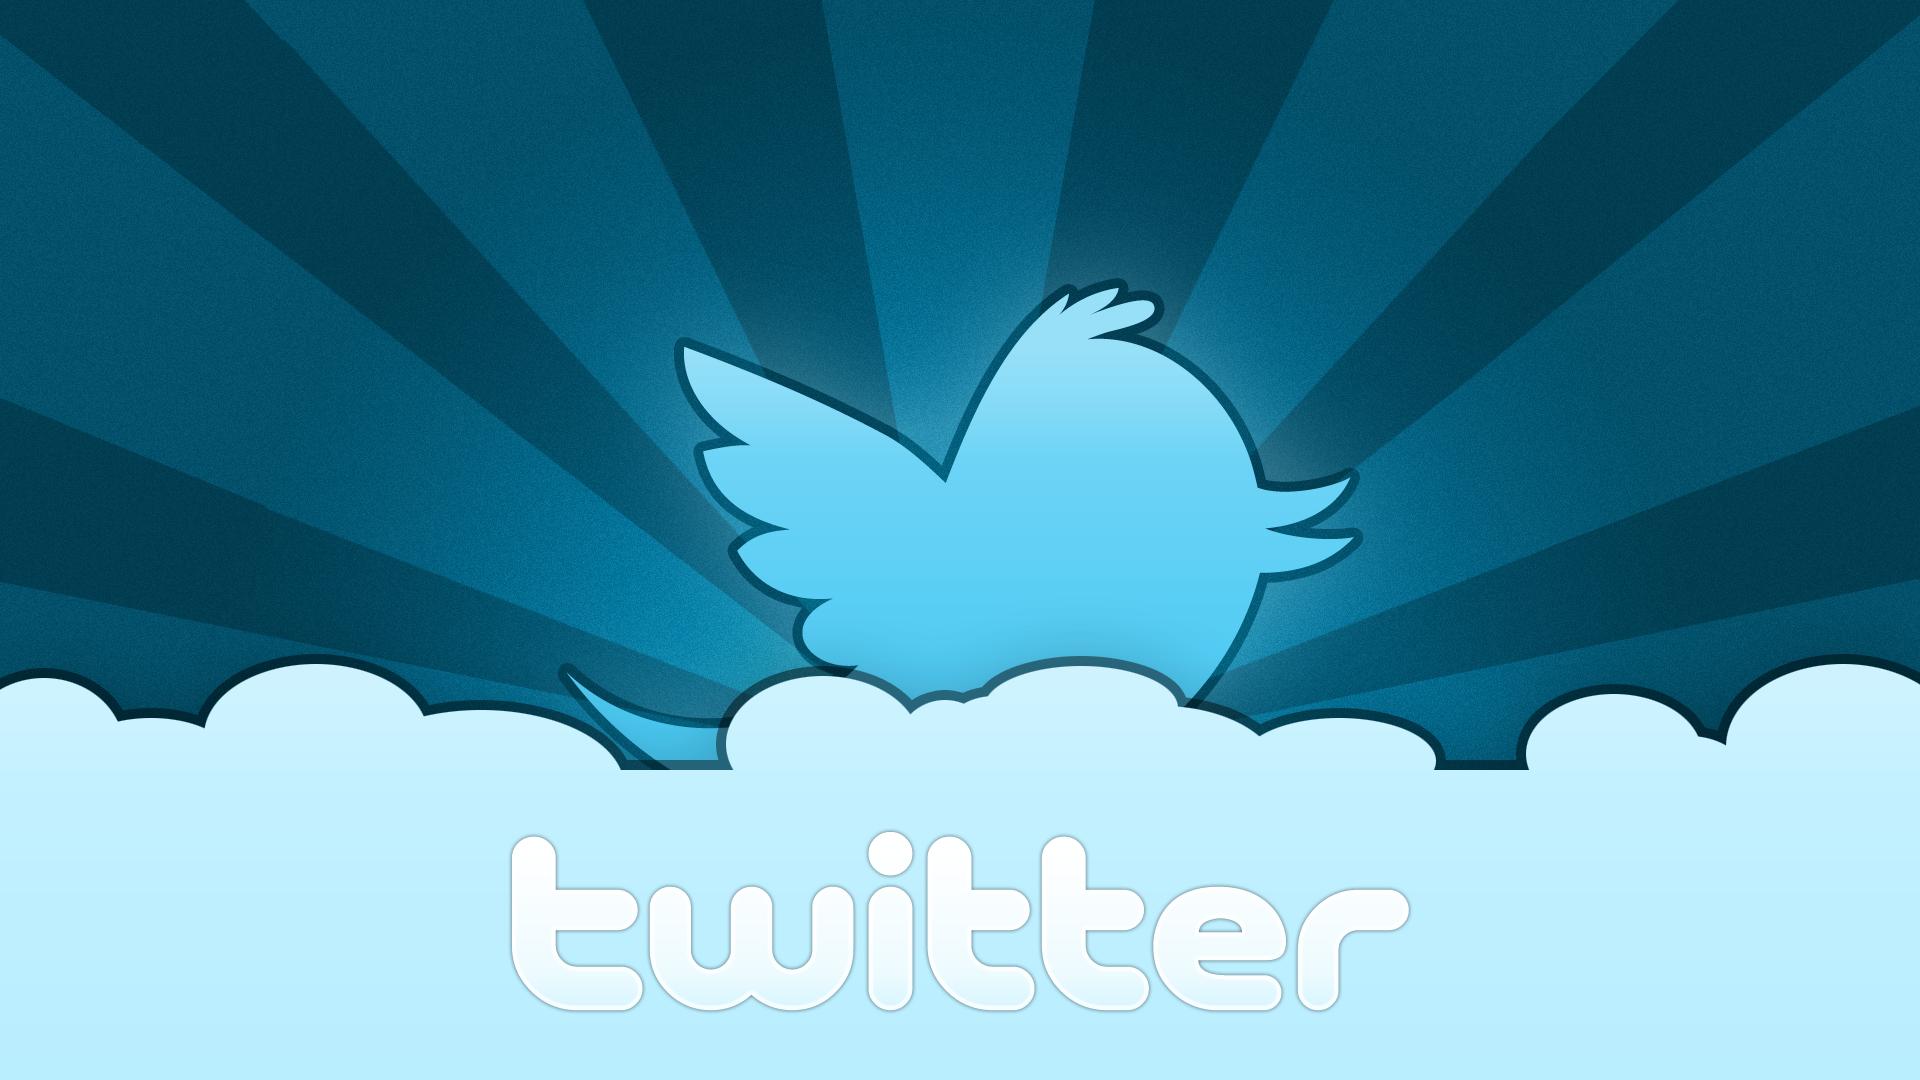 твиттер 2